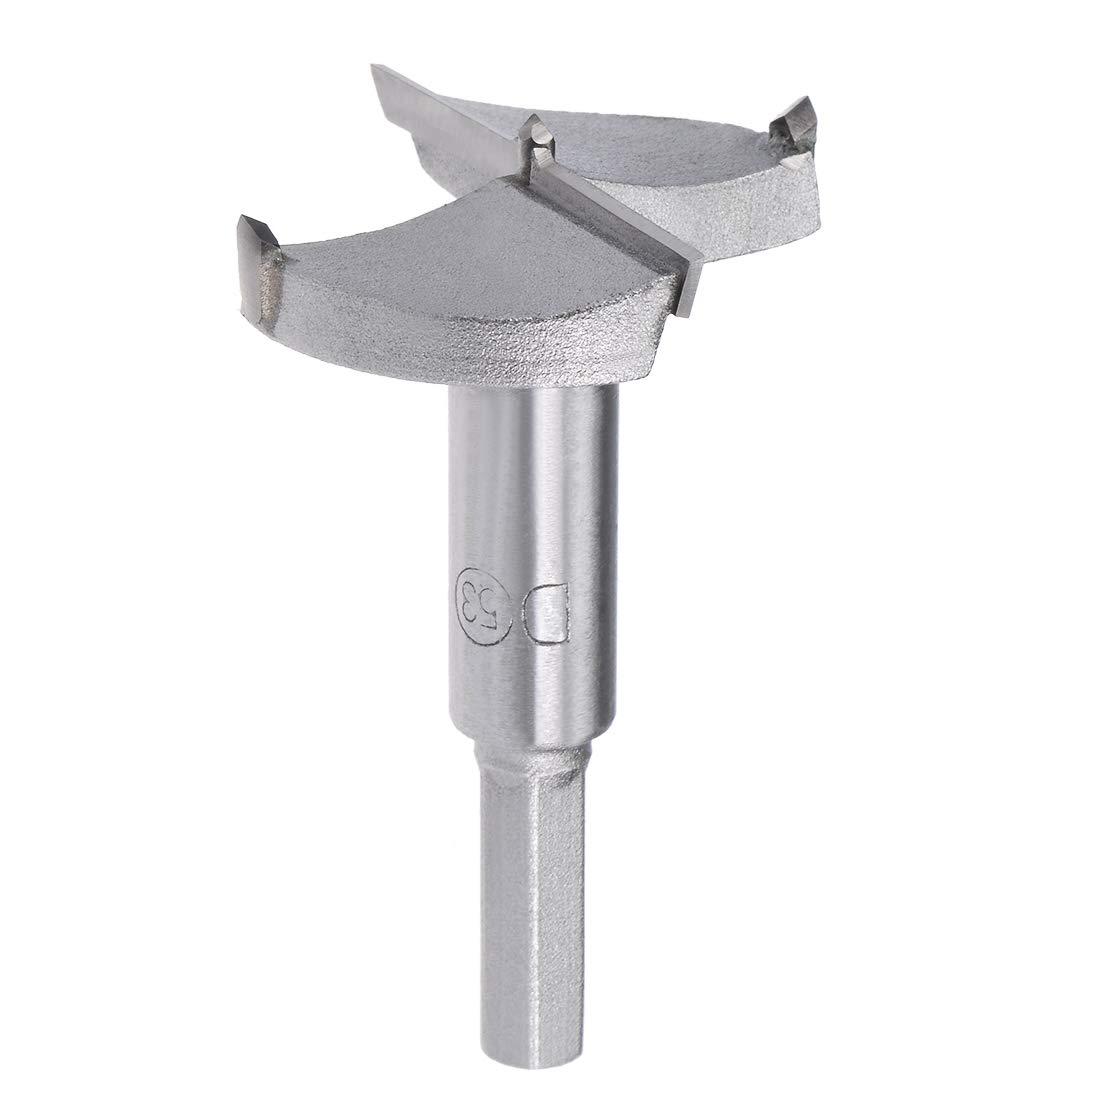 53 mm, v/ástago hexagonal de 10 mm Broca para taladro Sourcingmap